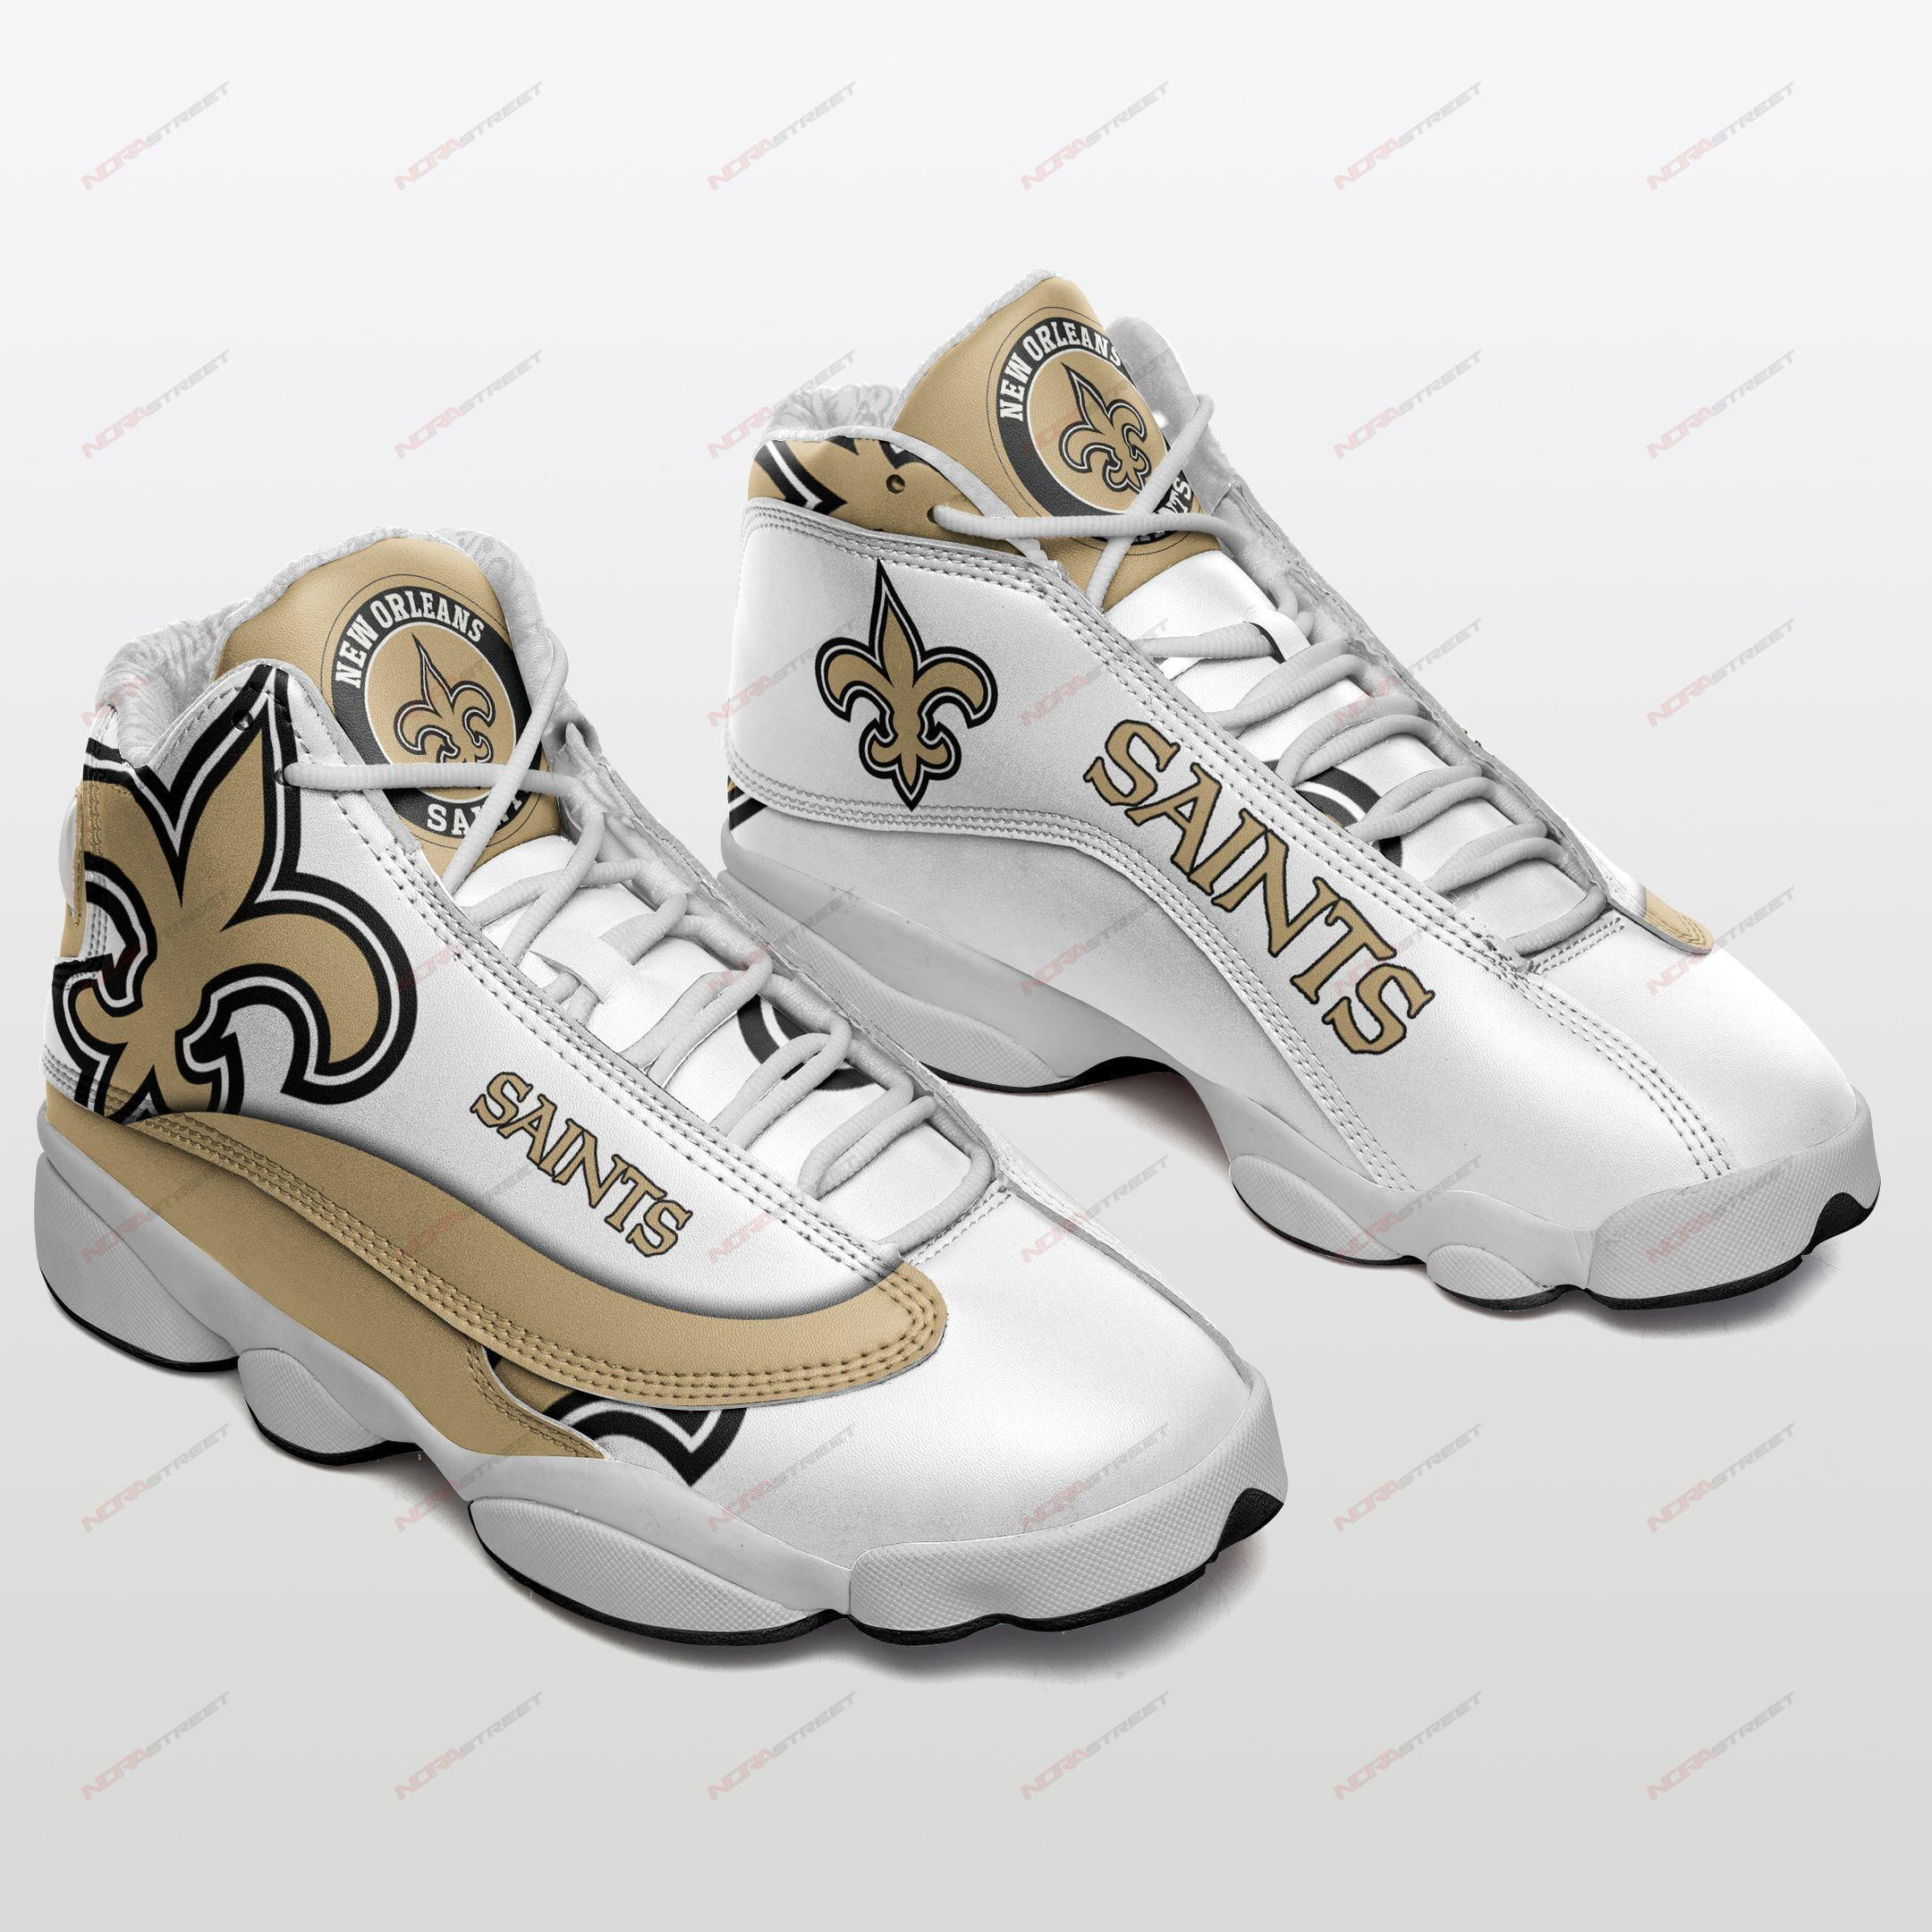 New Orleans Saints Air Jordan 13 Sneakers Sport Shoes